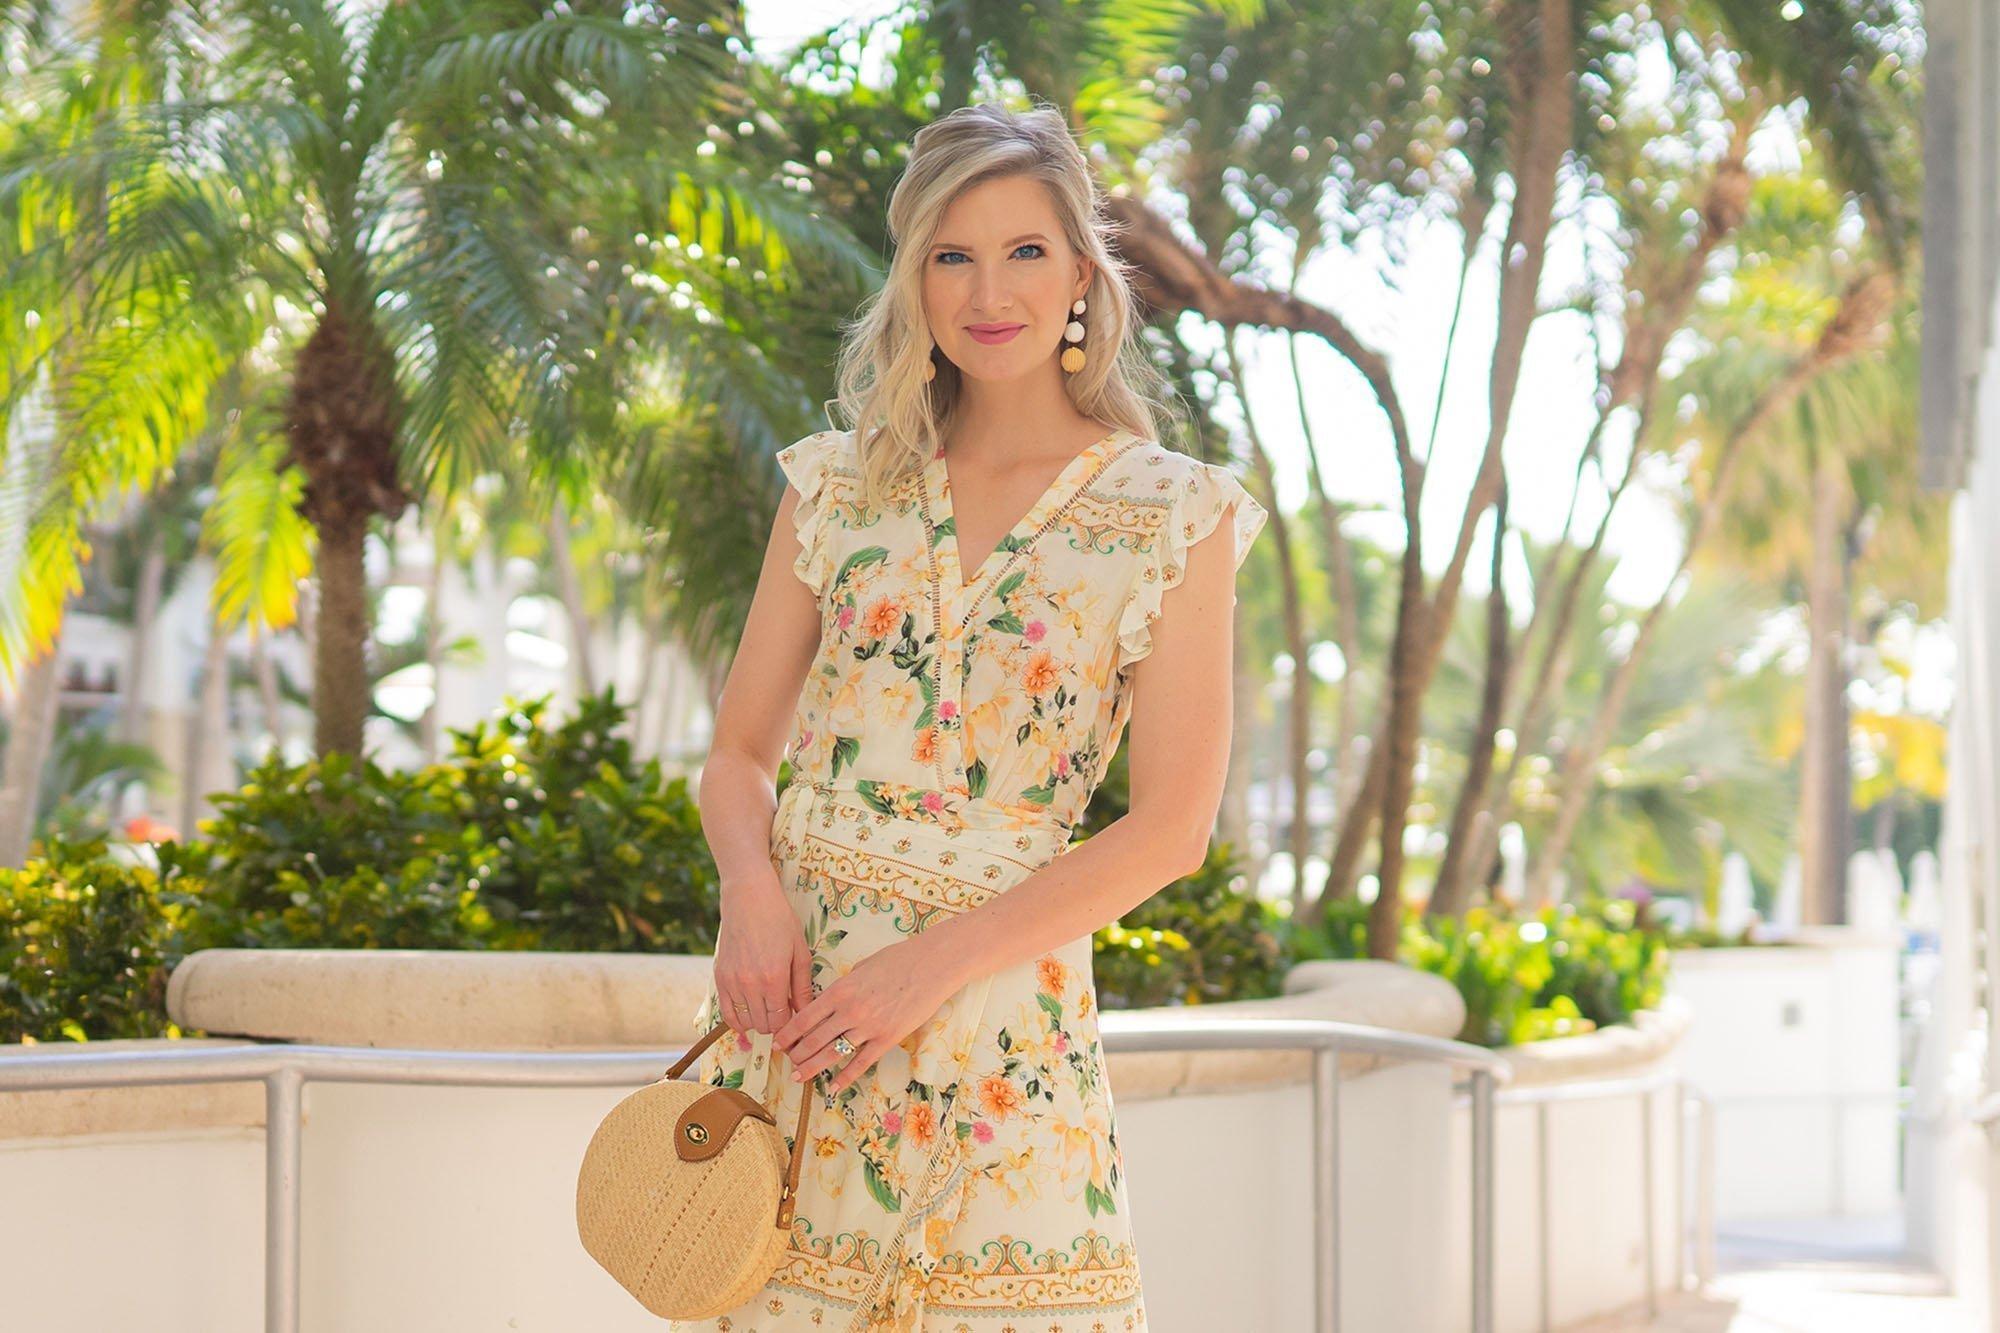 Ashley Brooke wearing Farm Rio Floral Dress on South Beach